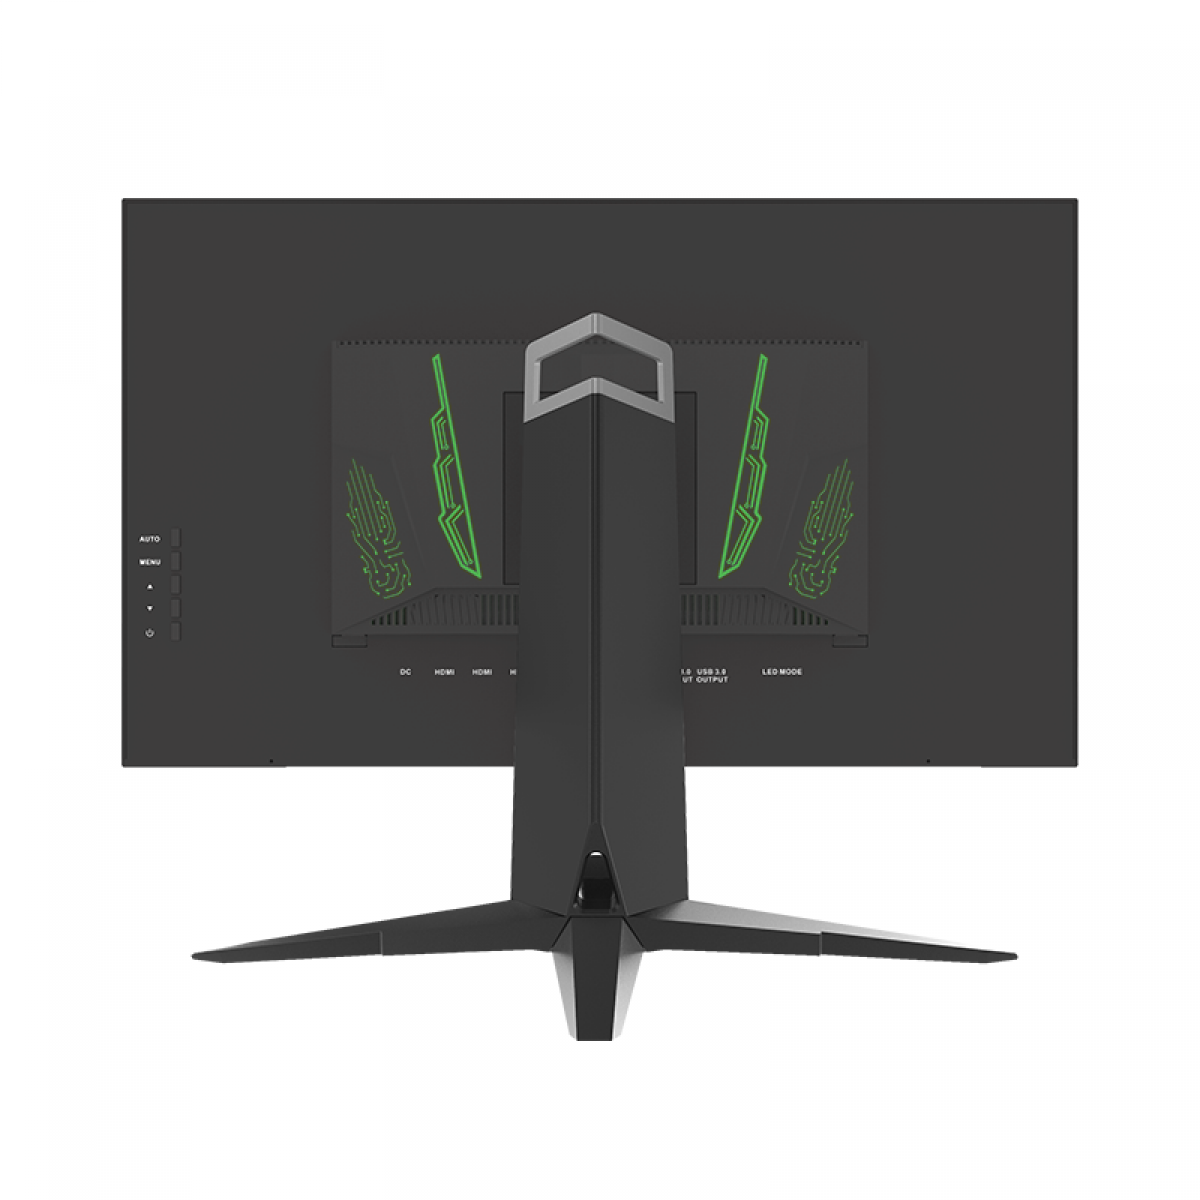 Monitor Gamer TIEM, 27 Pol, QHD, IPS, 1ms, 165Hz, HDMI/DP, T27QSSM